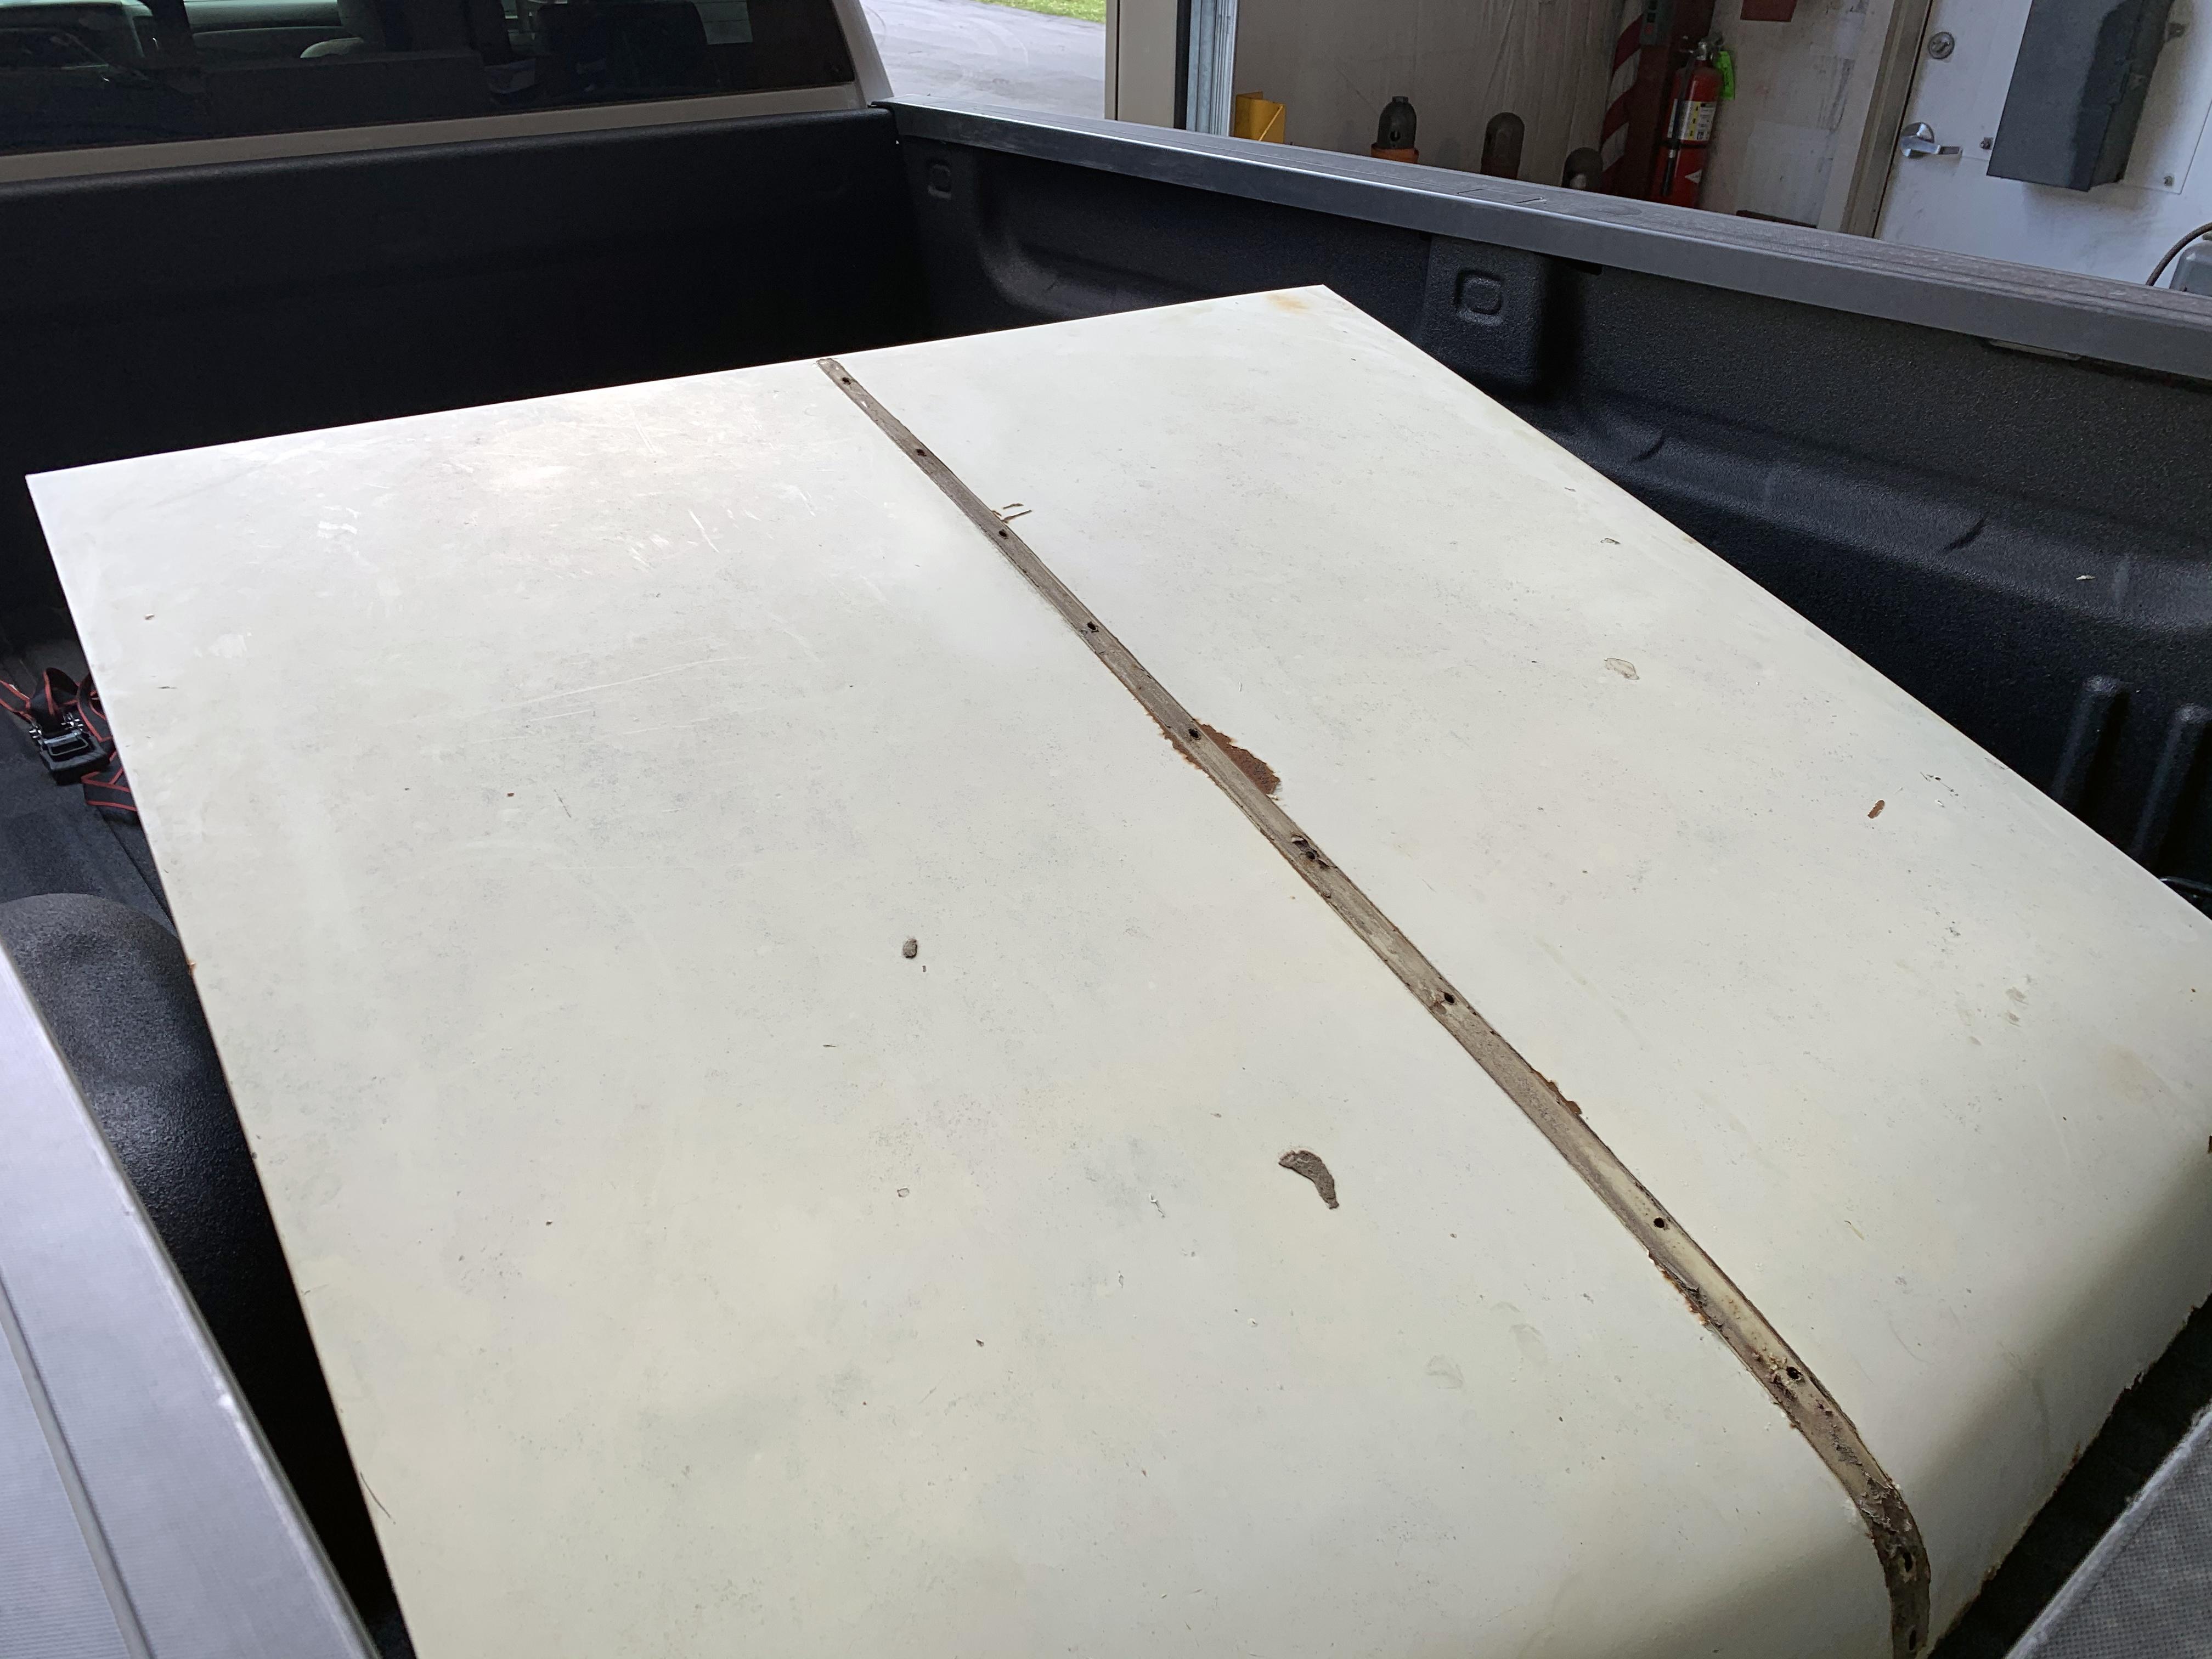 1_scotts-hotrods-65-cutlass-project-22